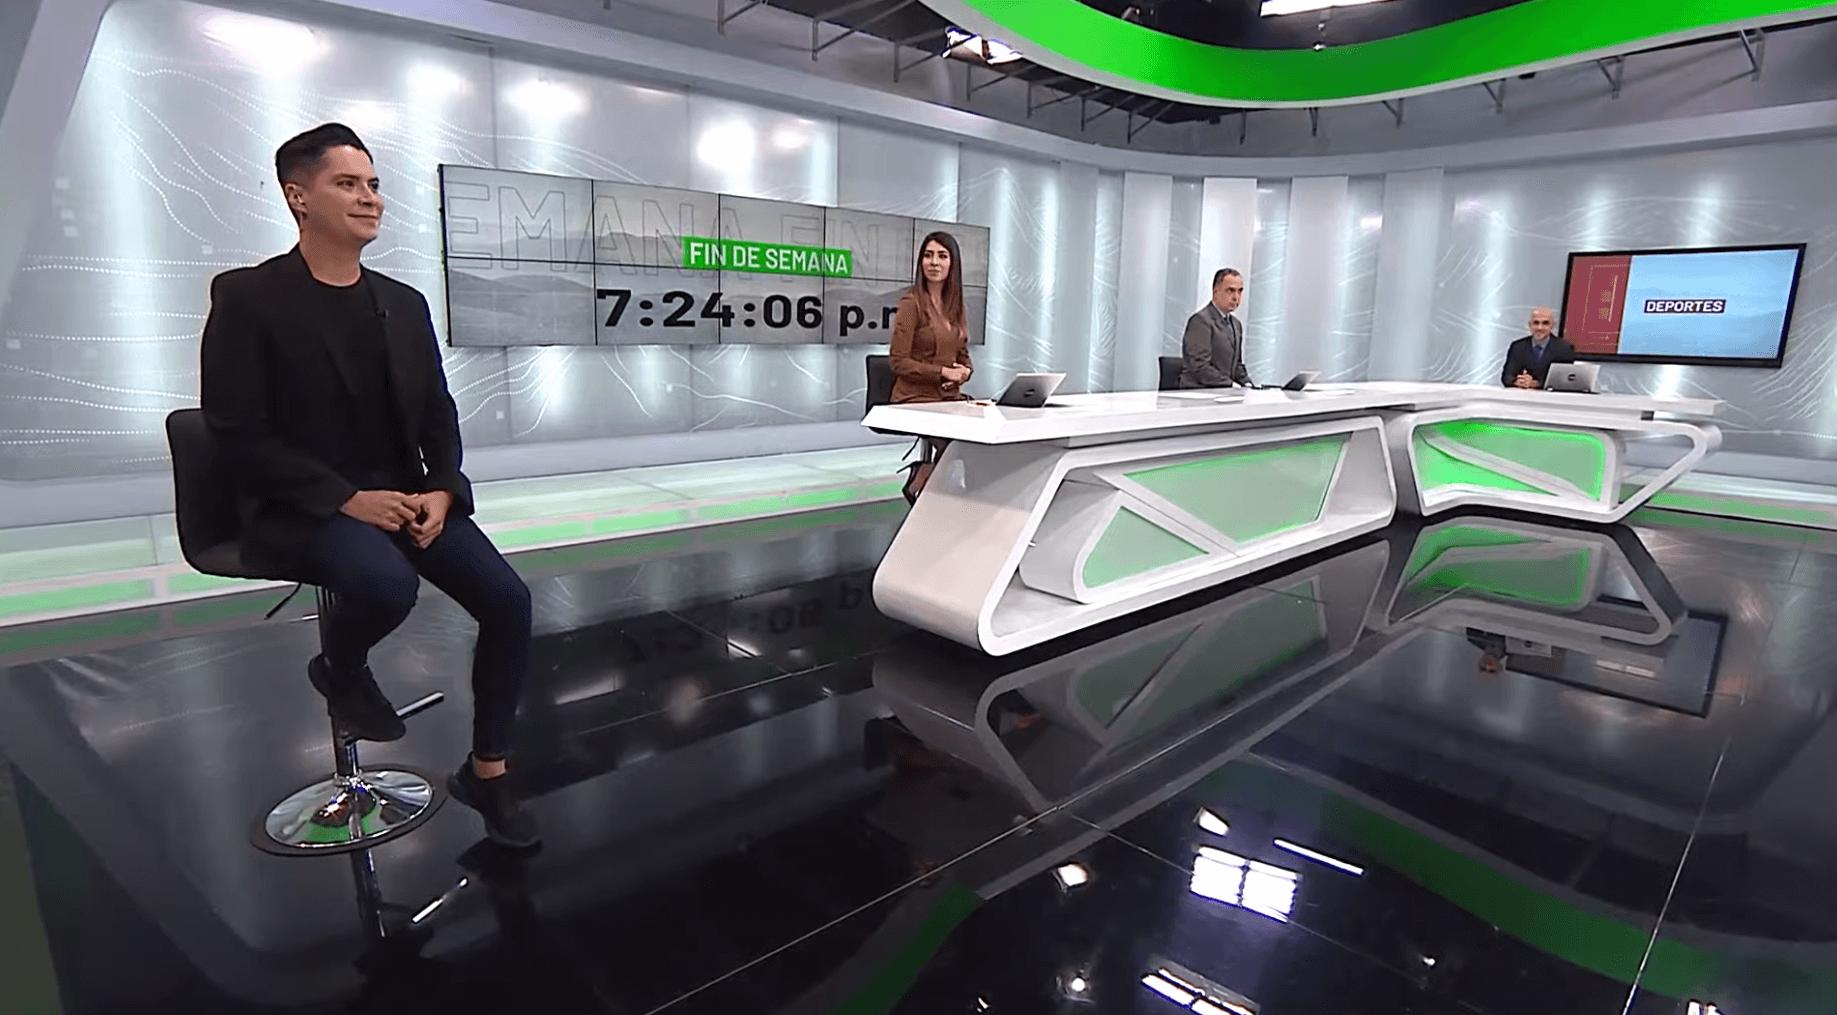 Teleantioquia Noticias – jueves primero de abril de 2021 noche